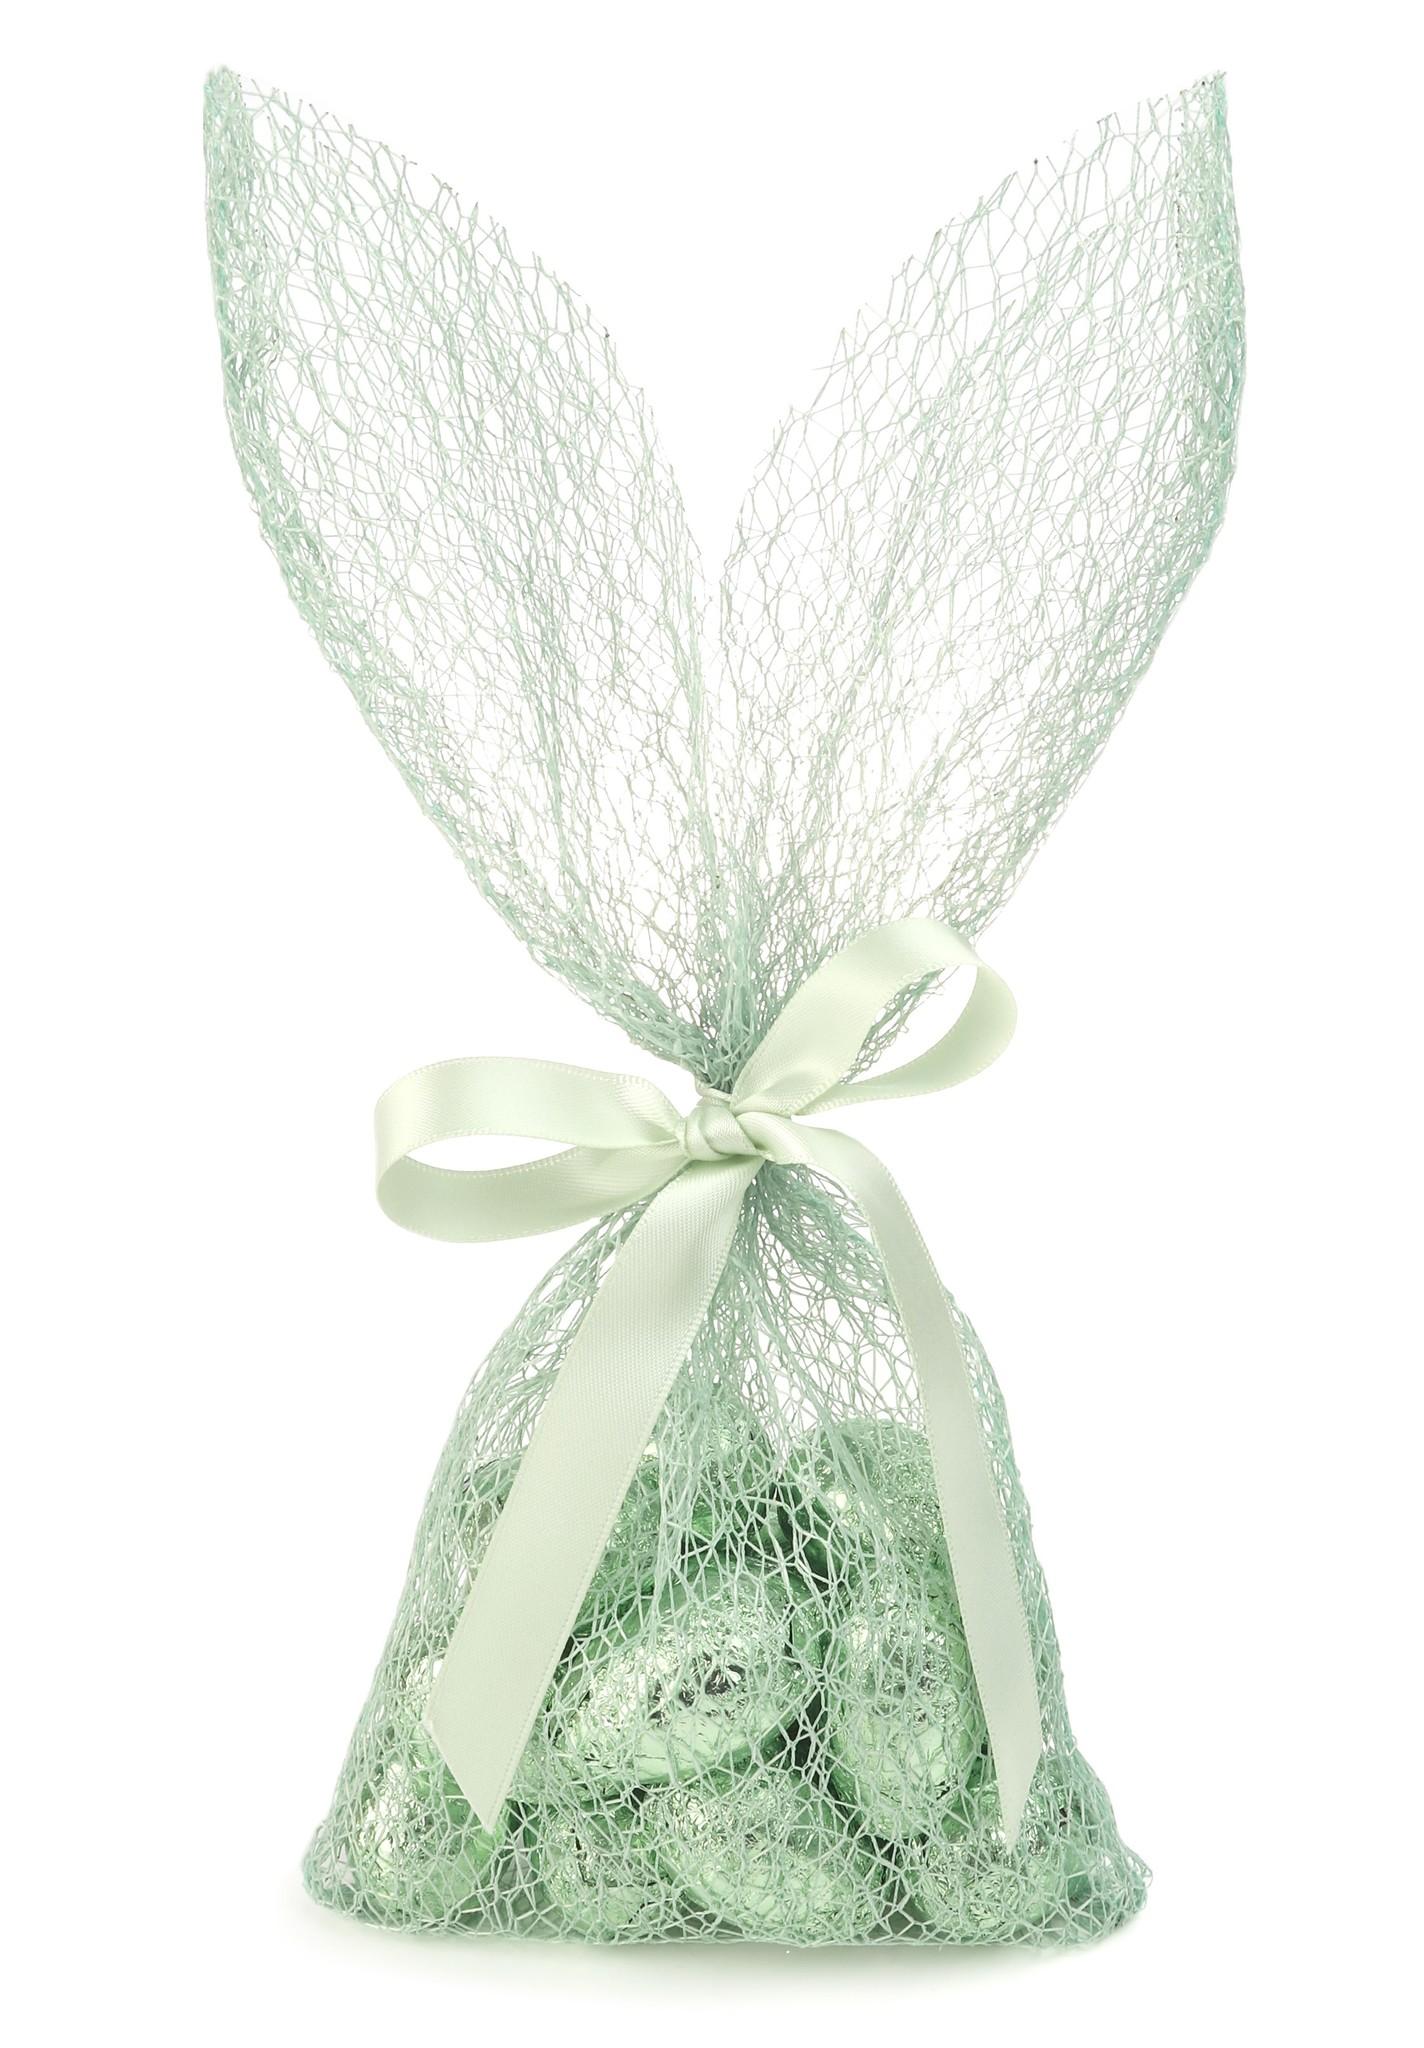 Bunny Bag  crispy - Mint  - 5 pieces